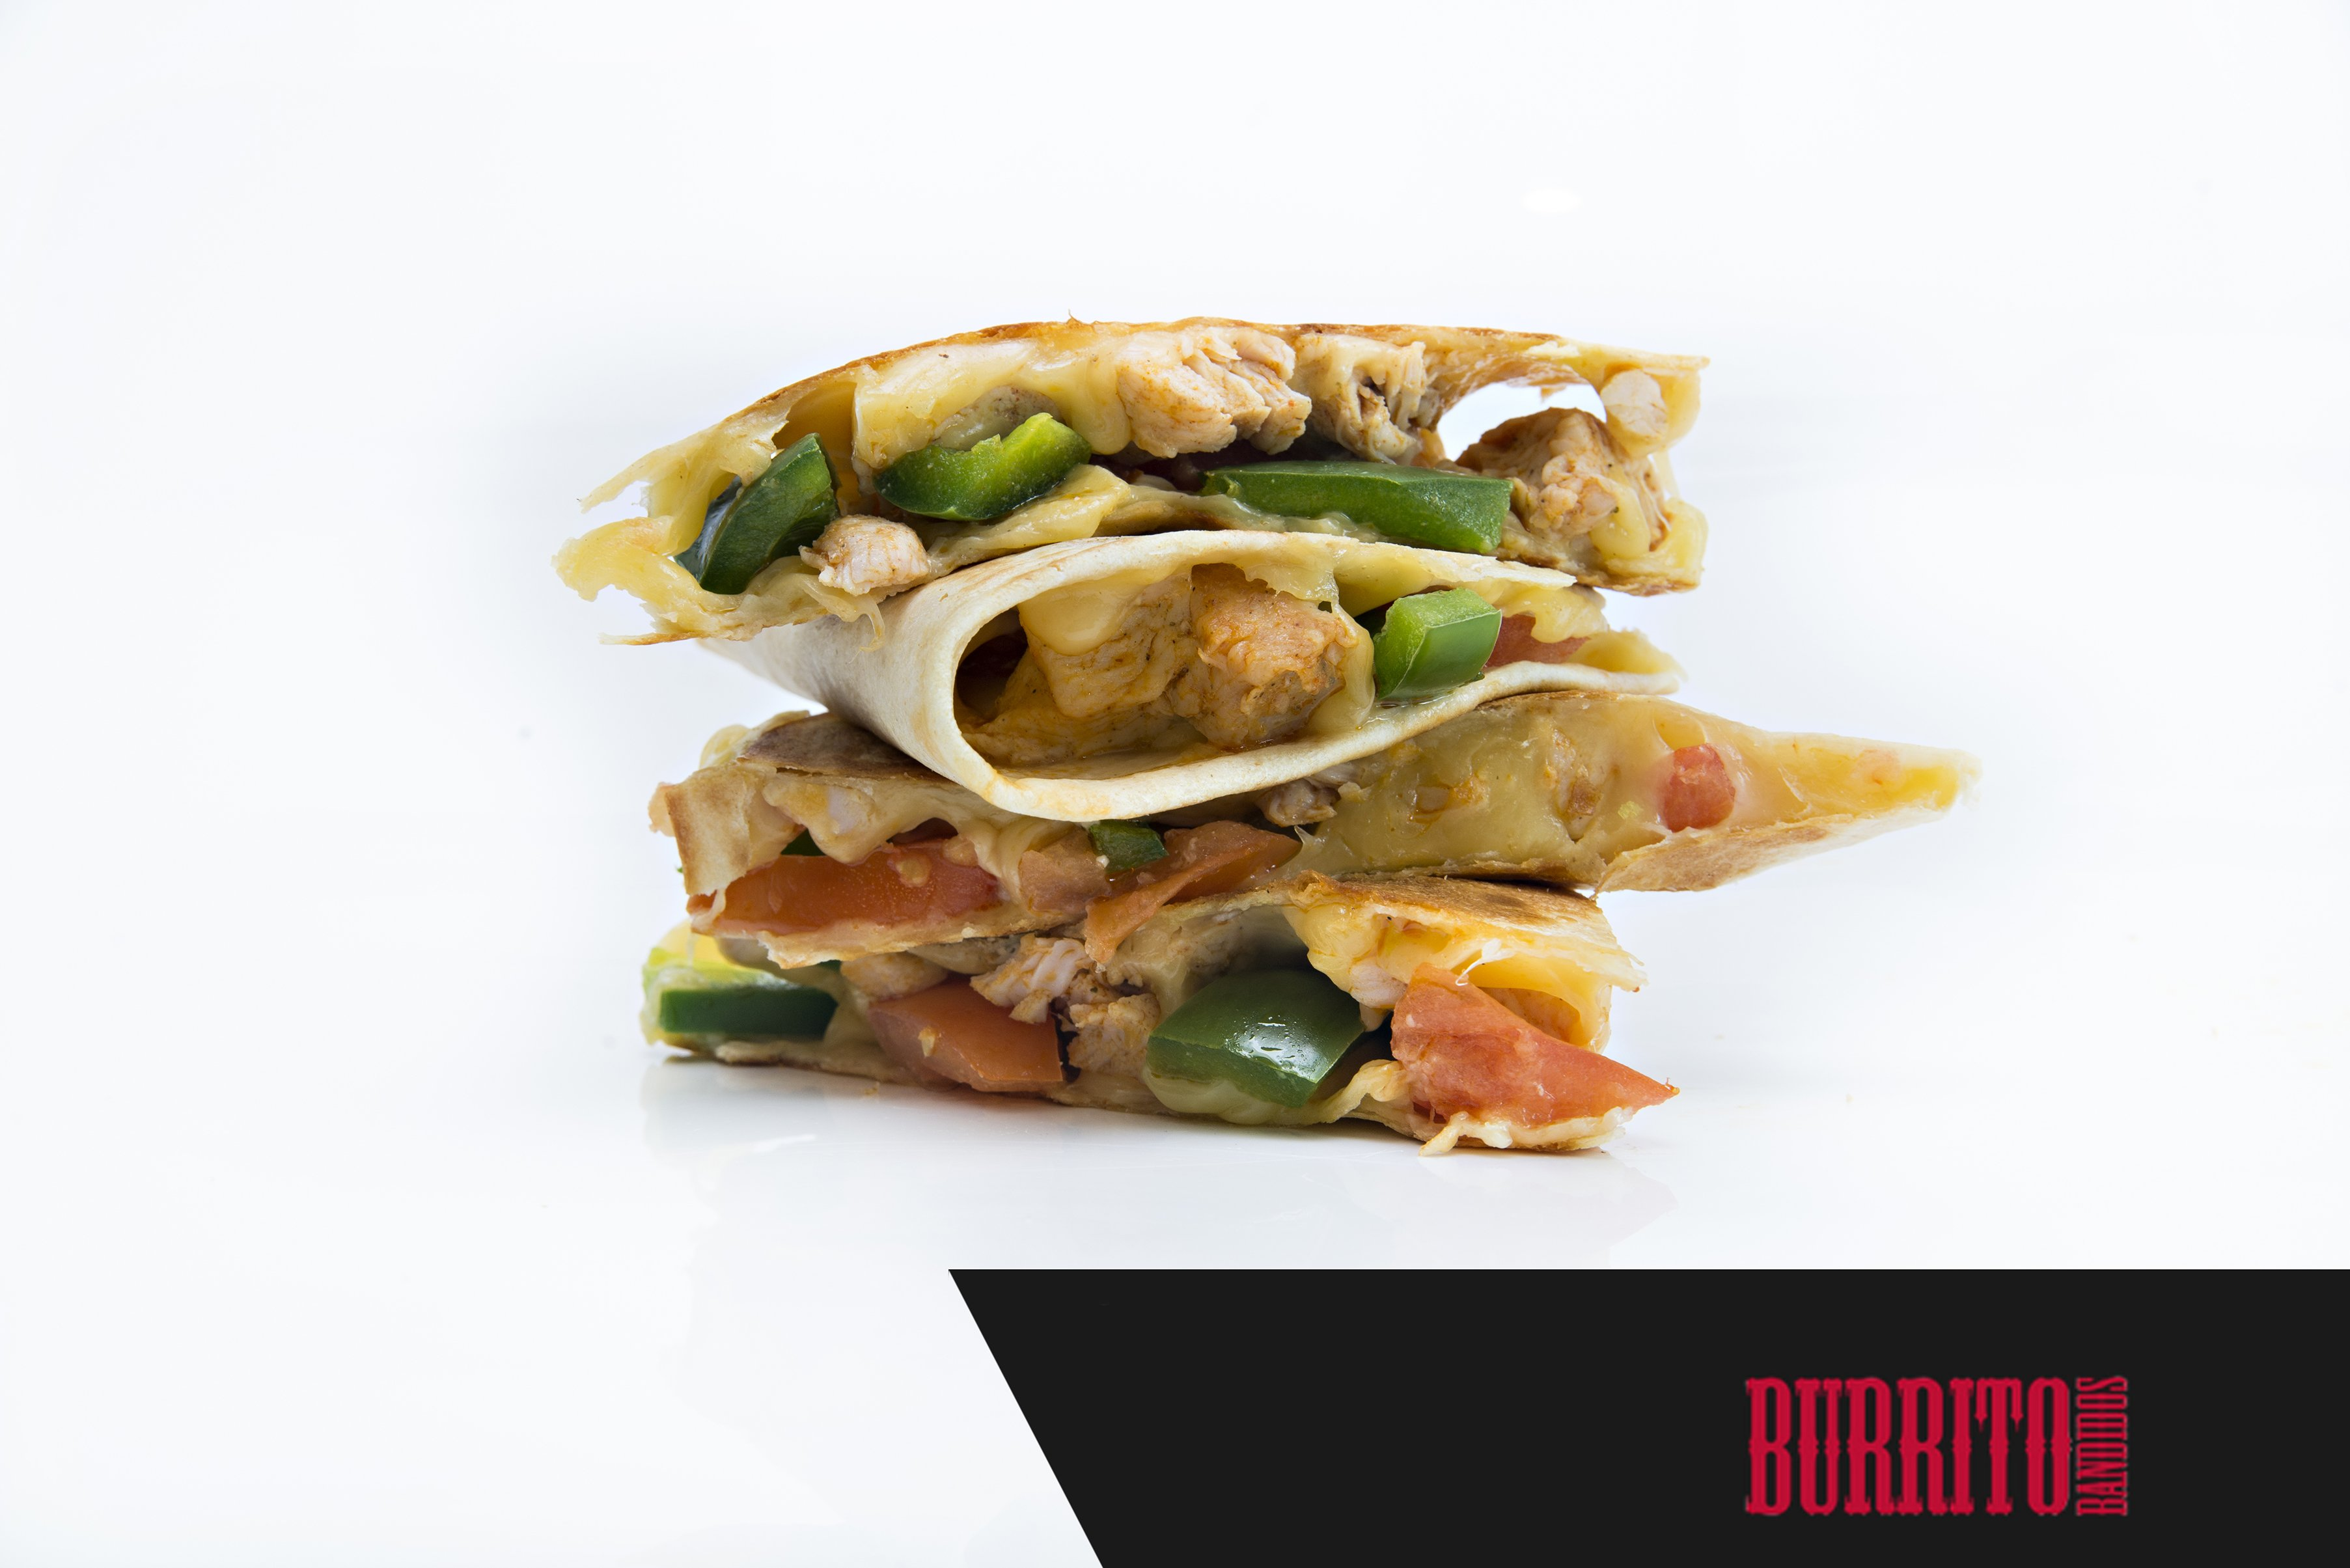 burritobandidos_6